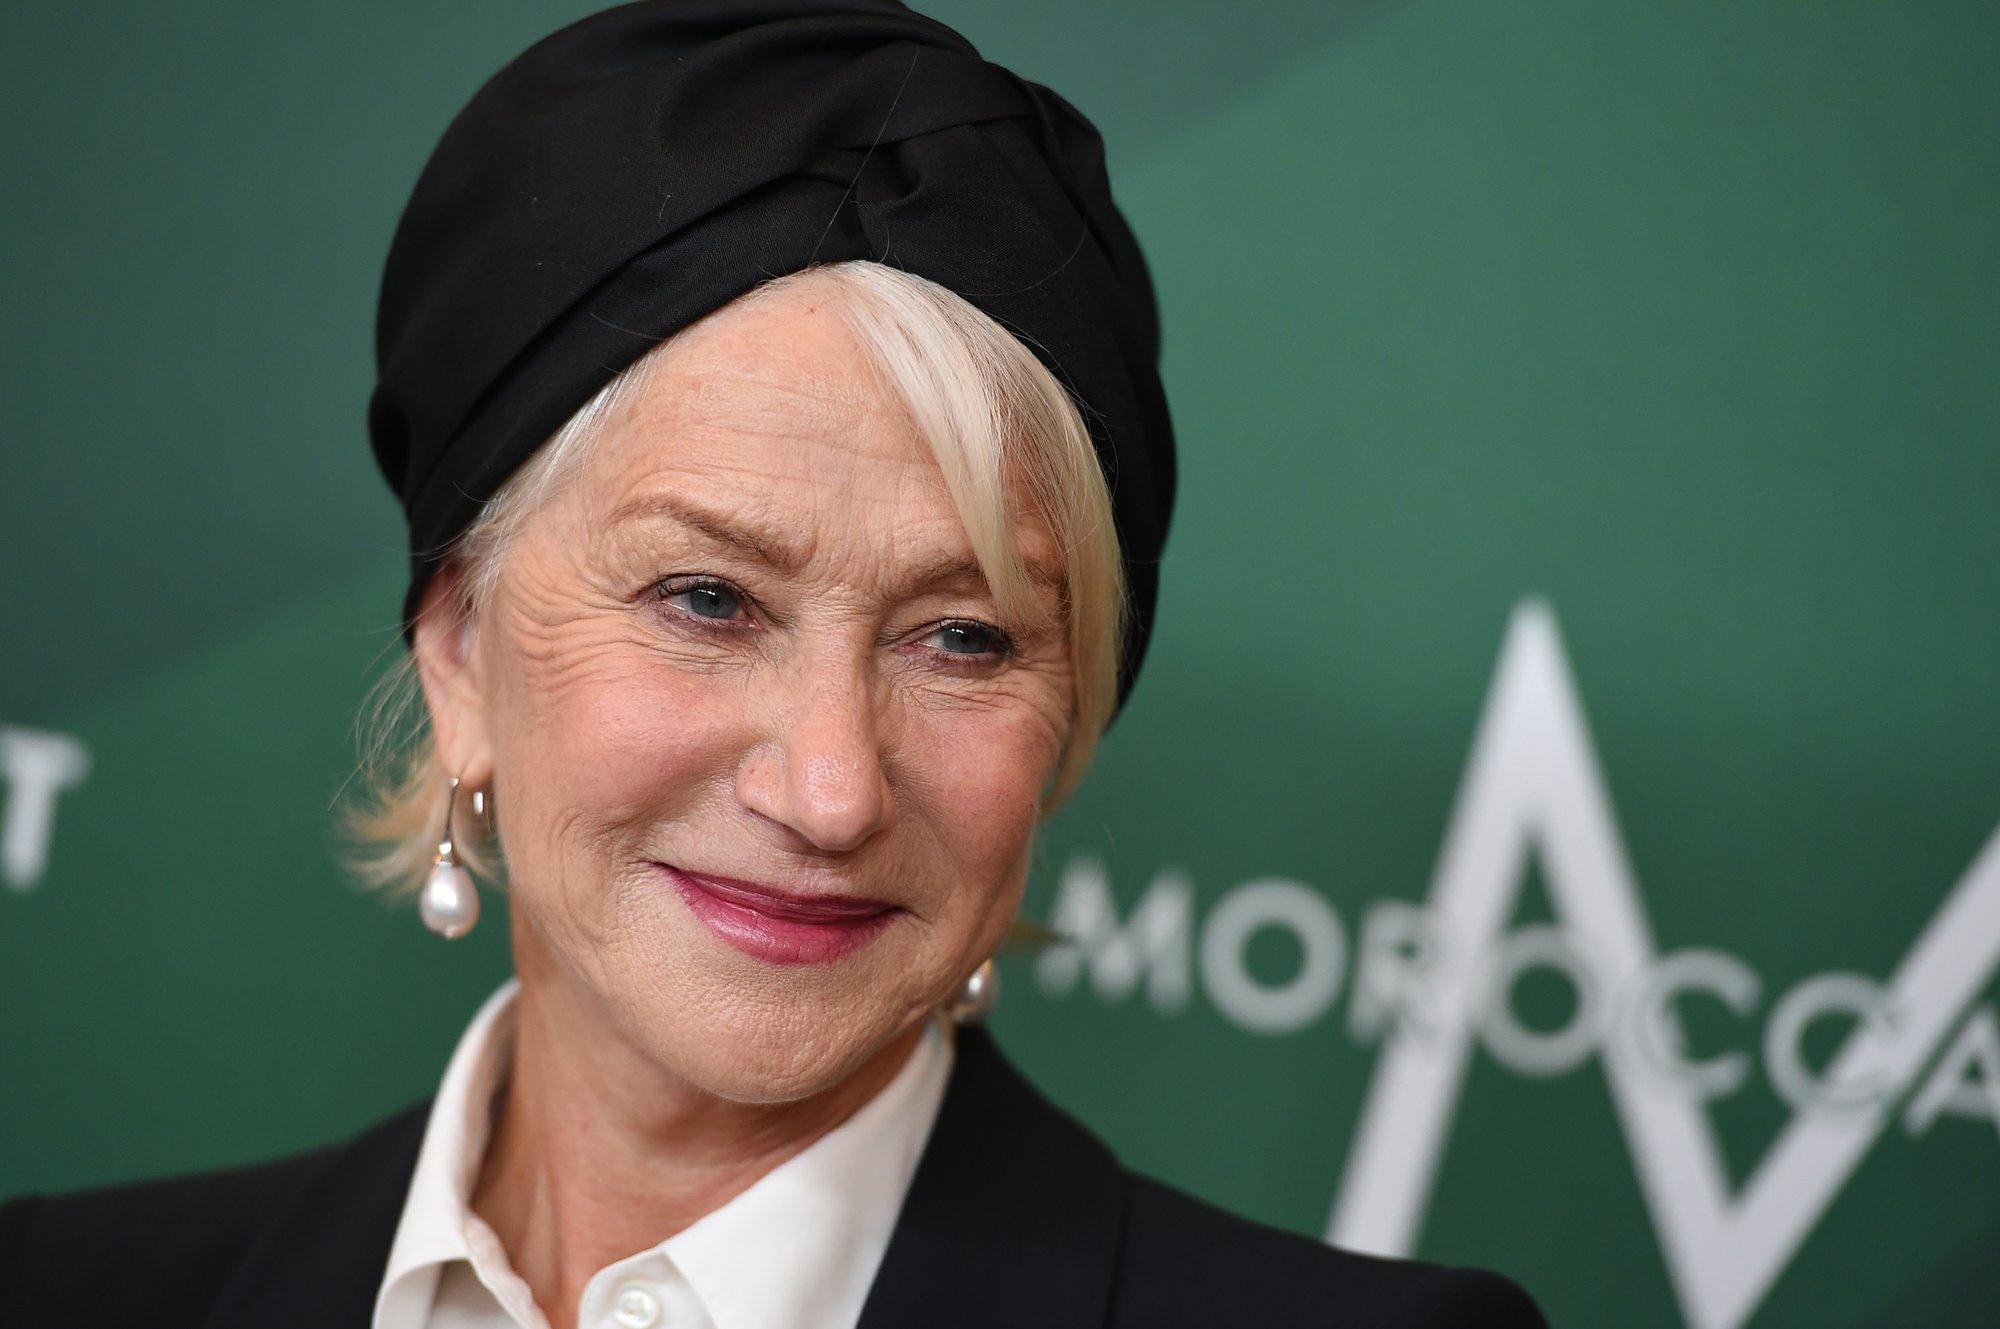 Helen Mirren calls on women to change the future by voting